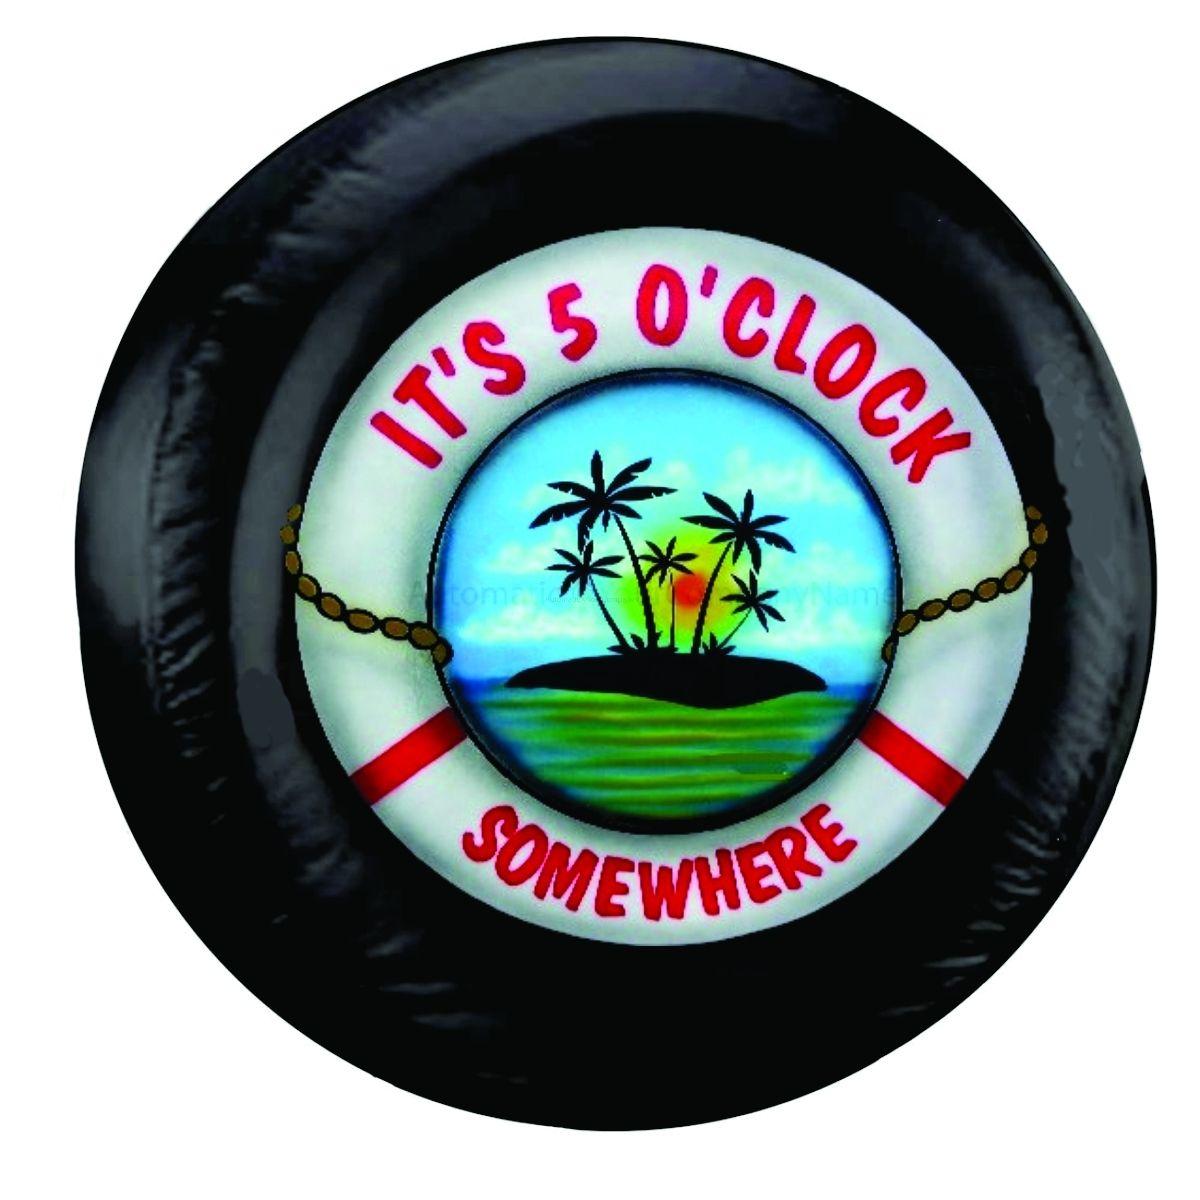 It S 5 O Clock Somewhere Lifesaver Spare Tire Cover On Black